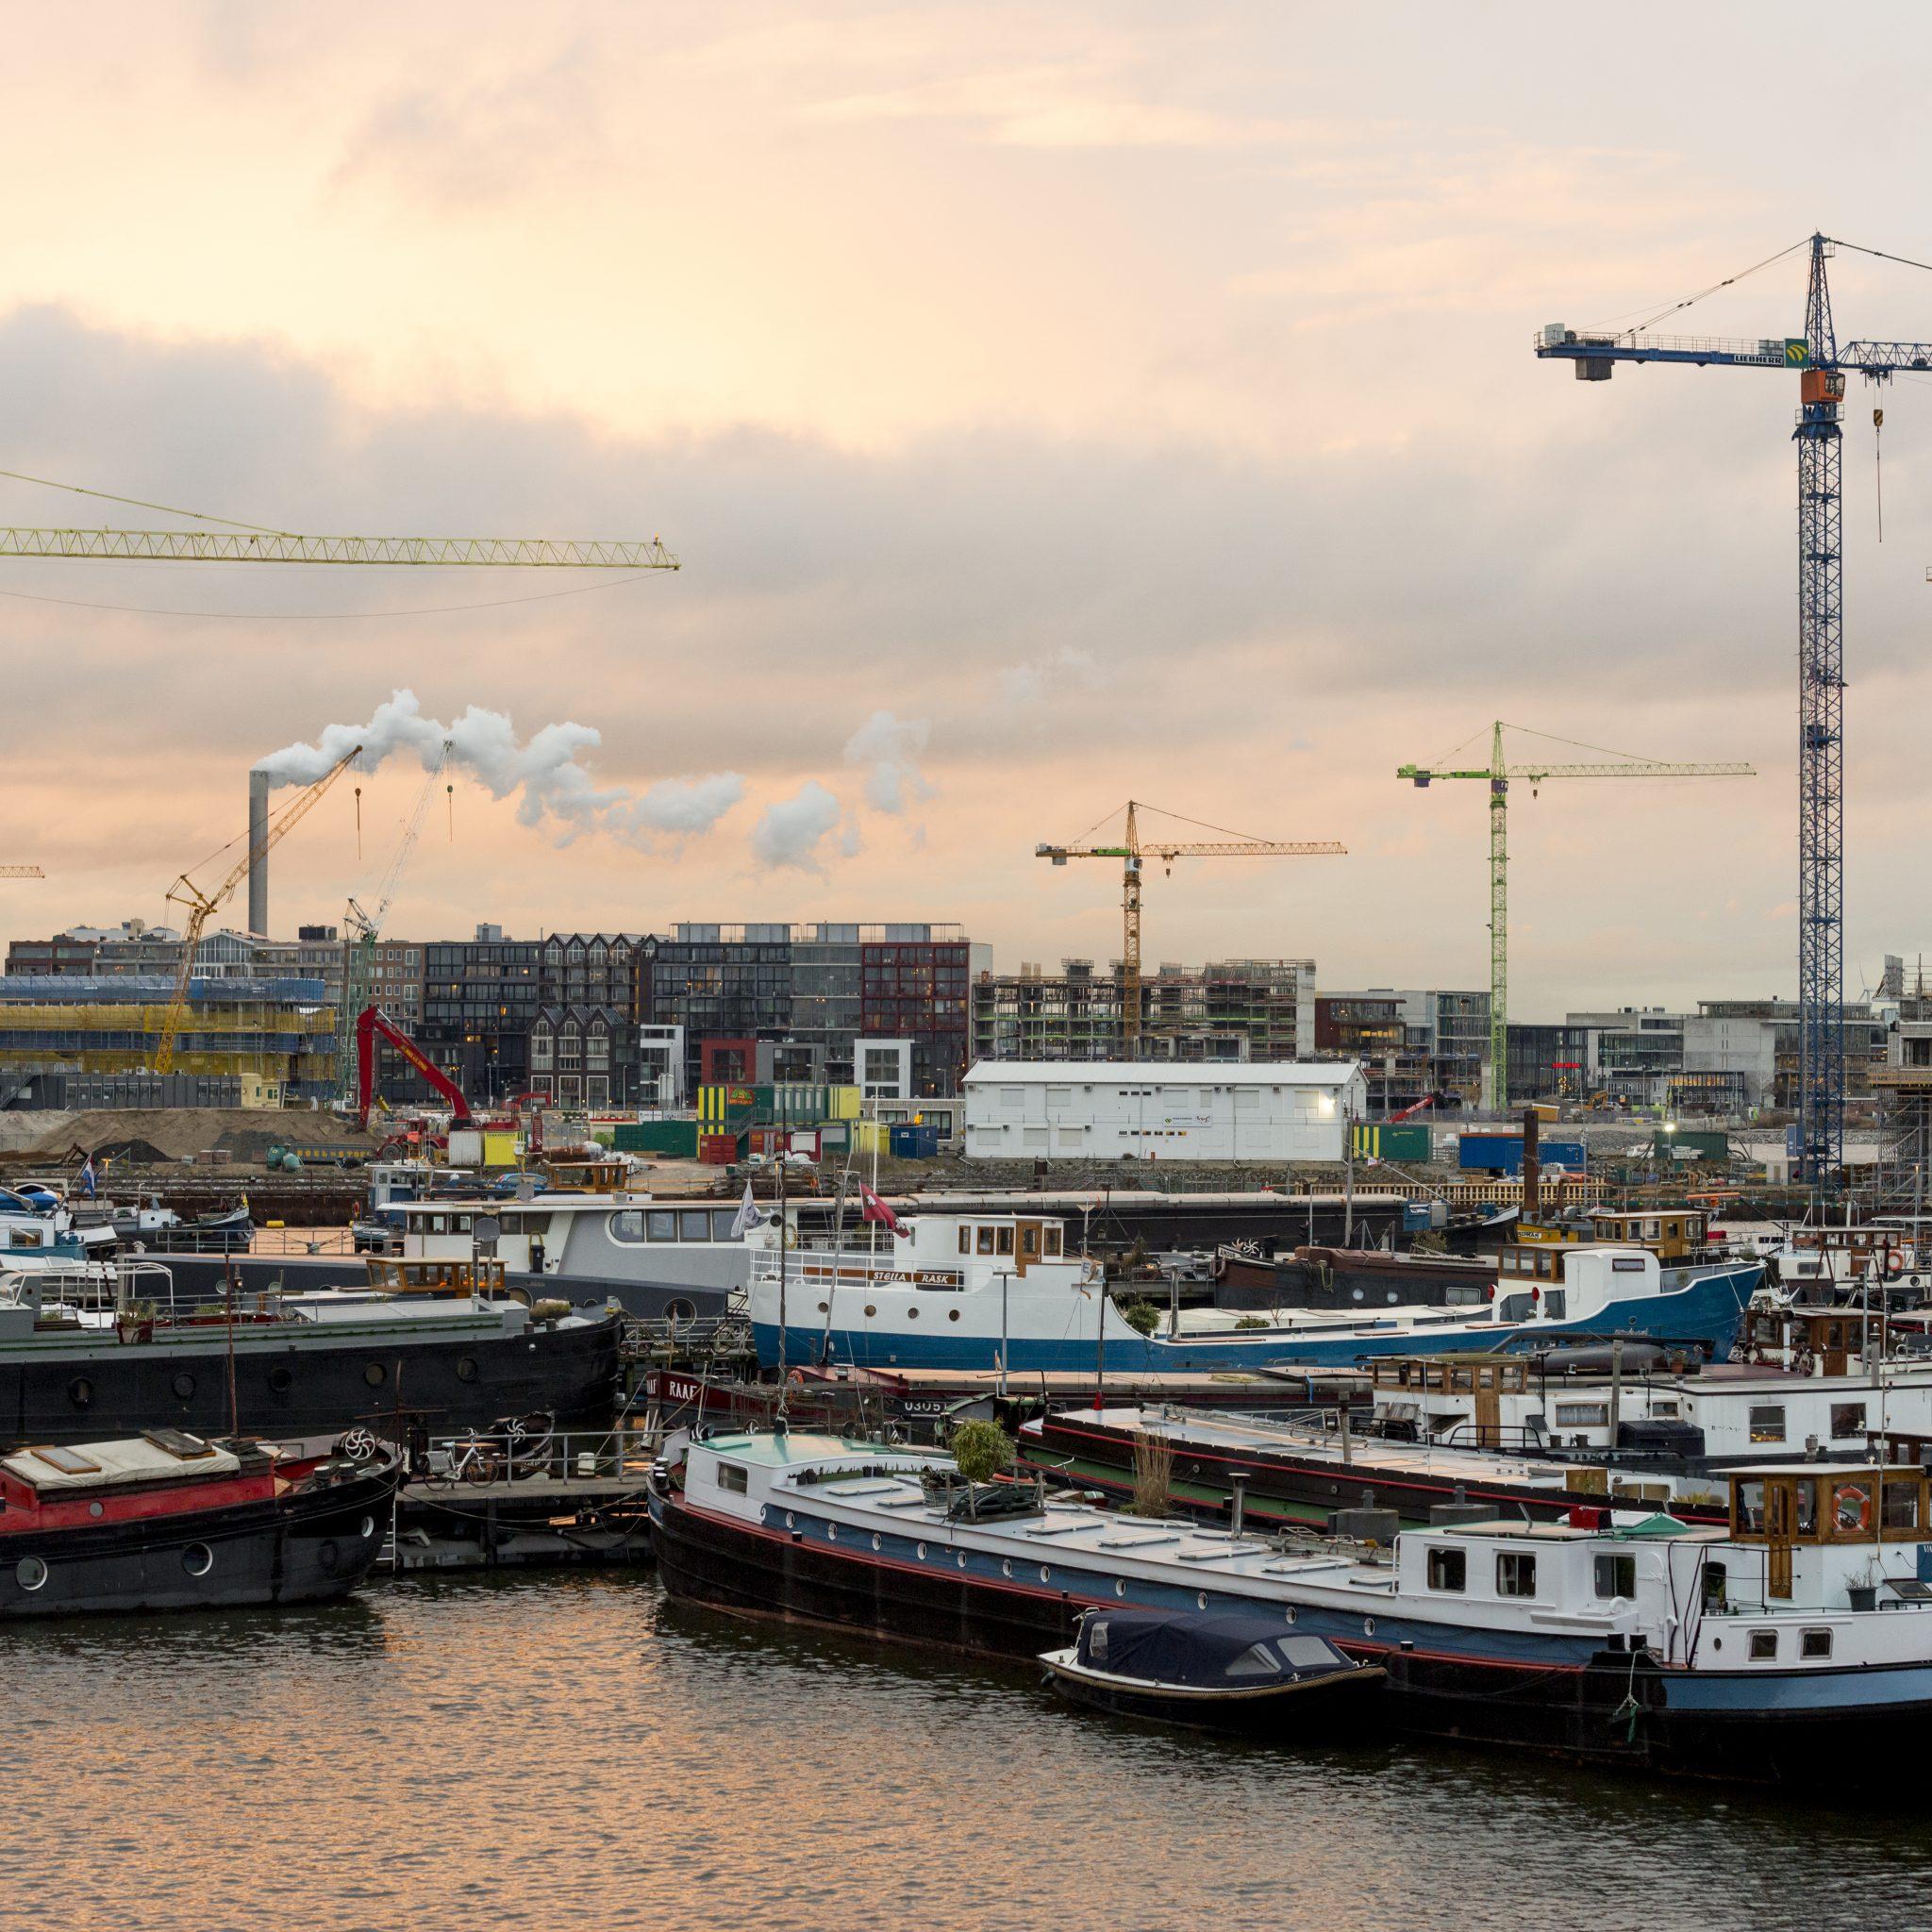 Woonschepen in de Amsterdamse Houthavens. (Foto ANP)